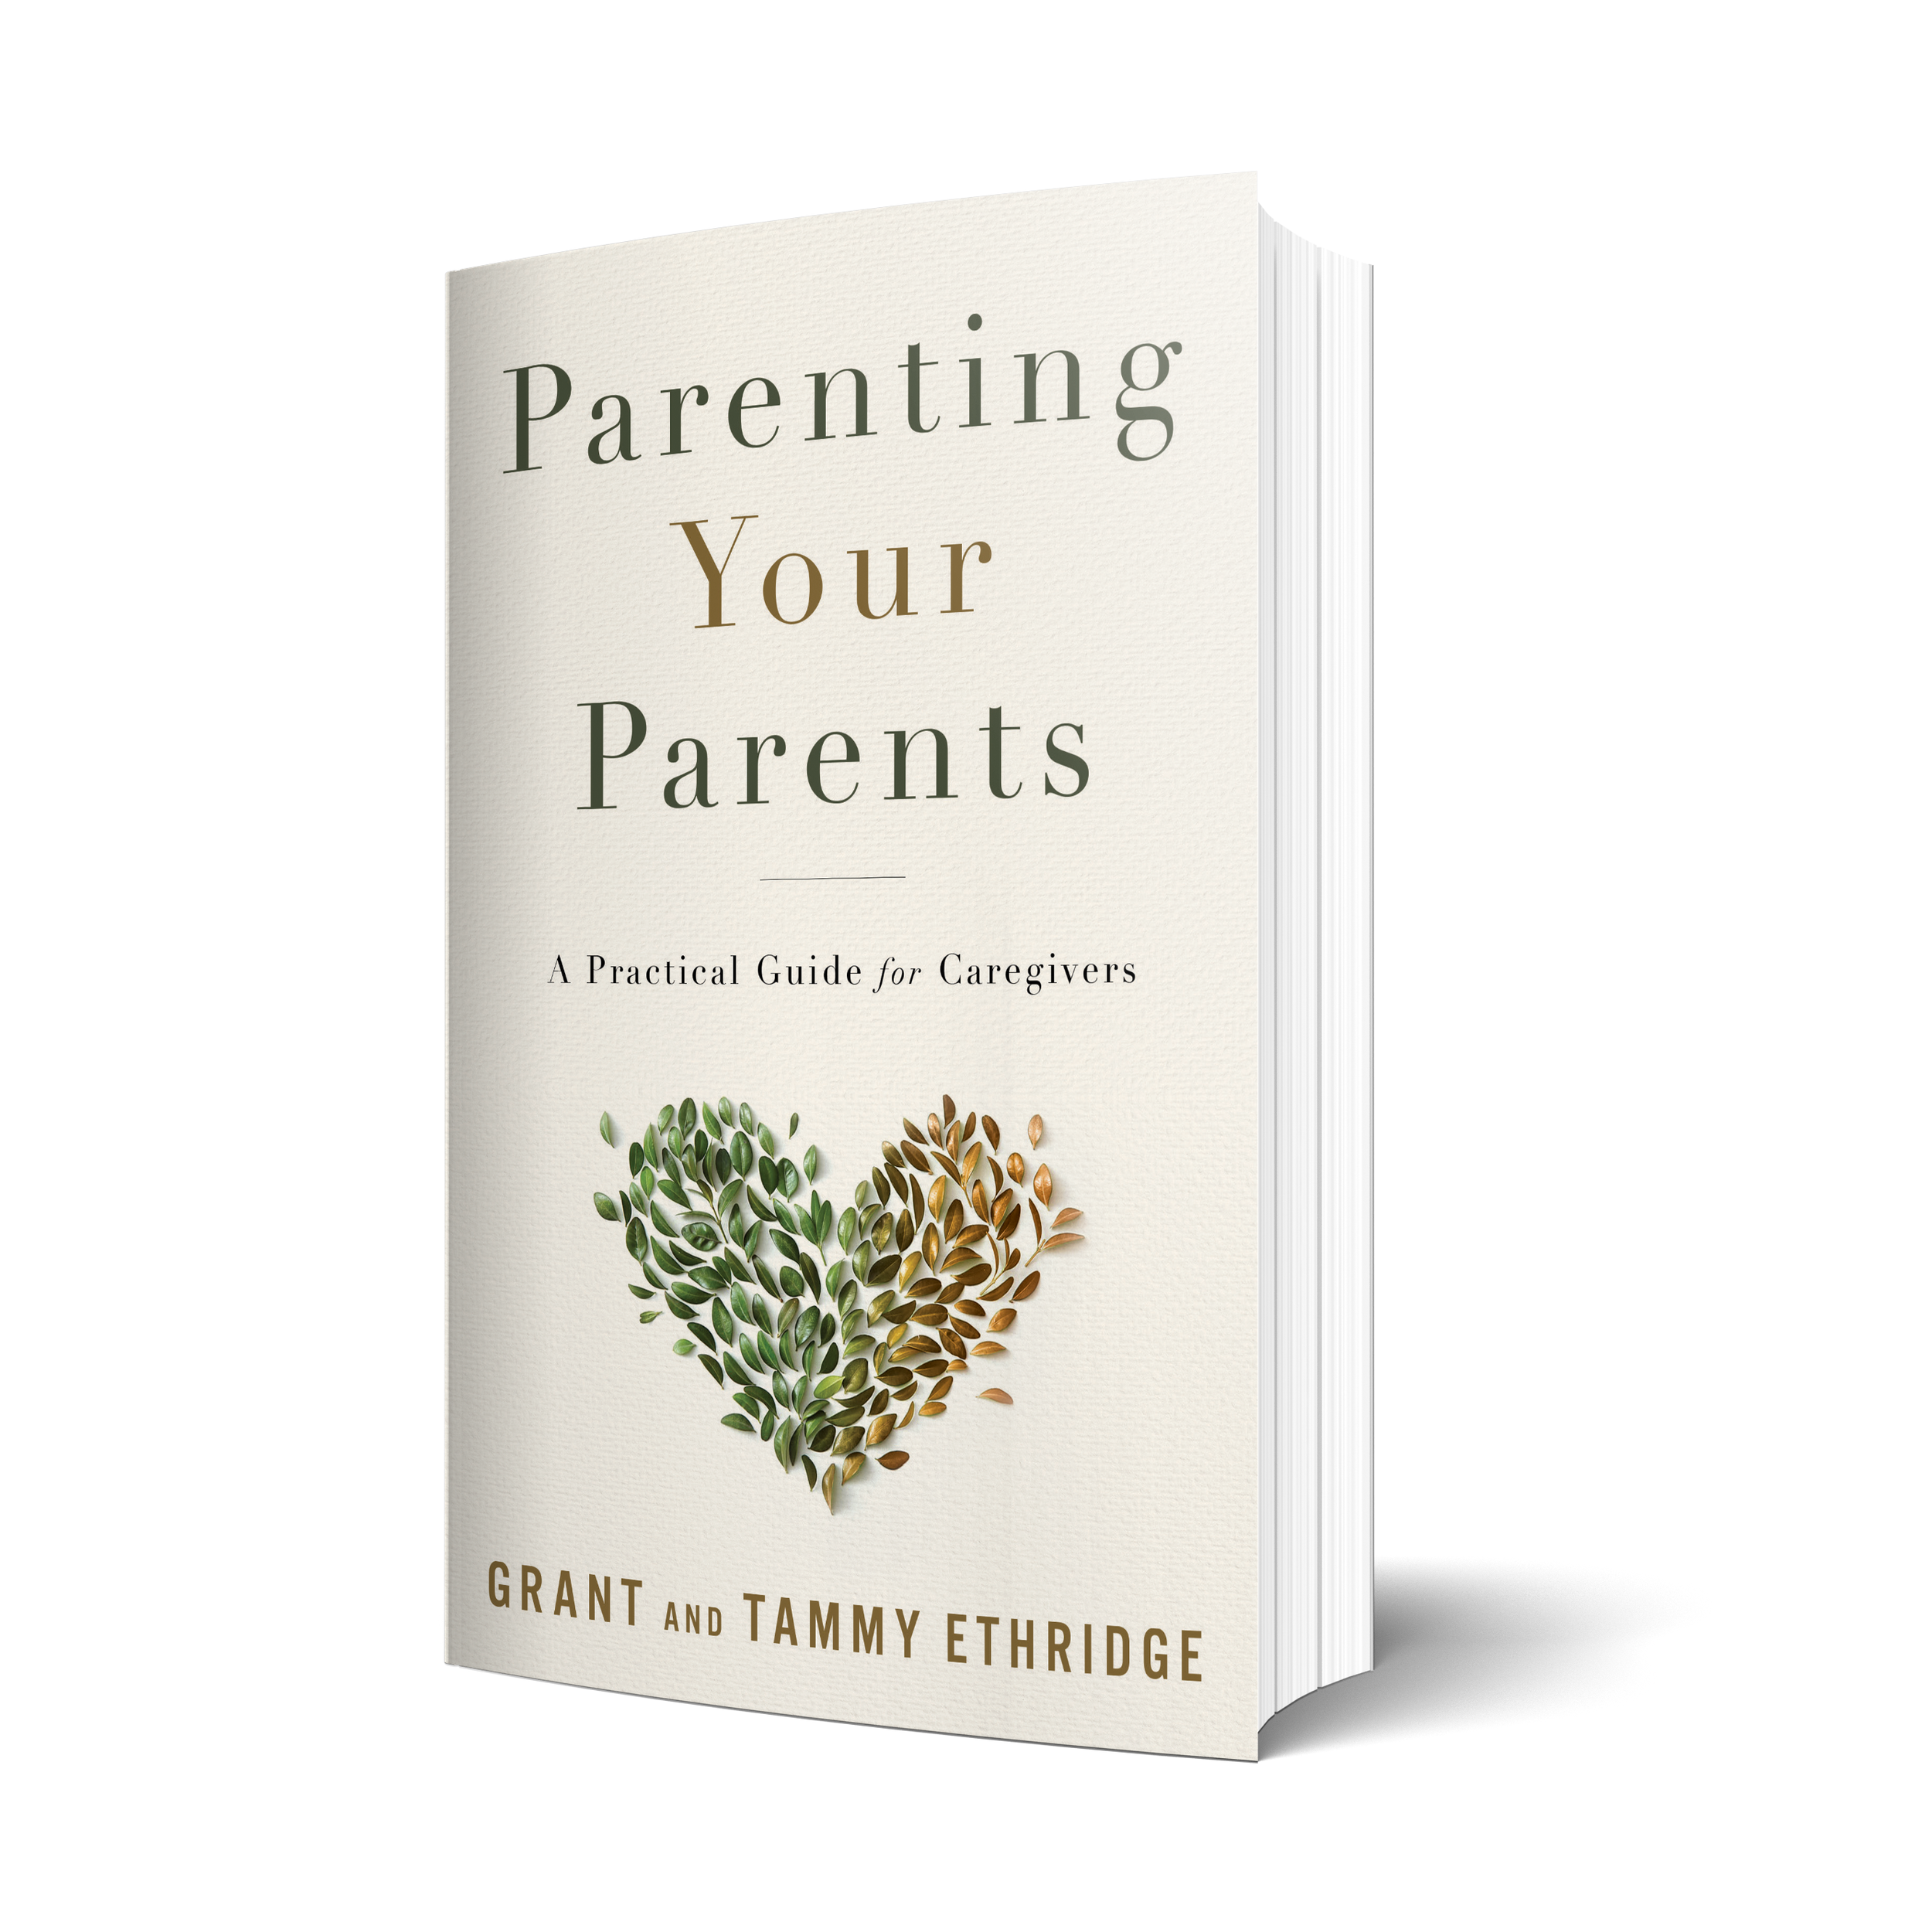 Parenting-Your-Parents-Book-Mock-Up.png